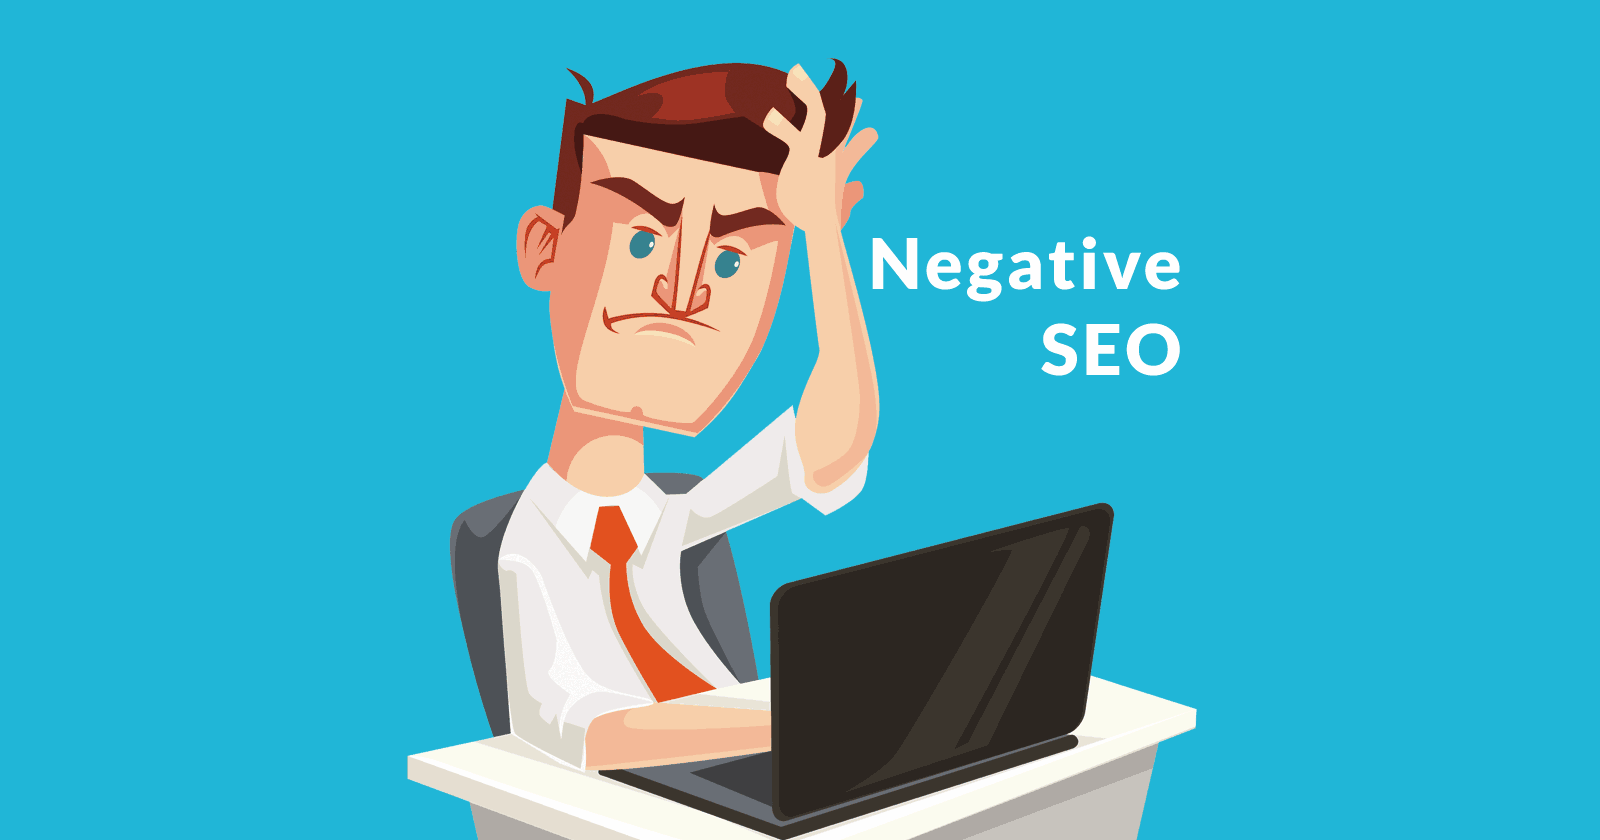 negative-seo-